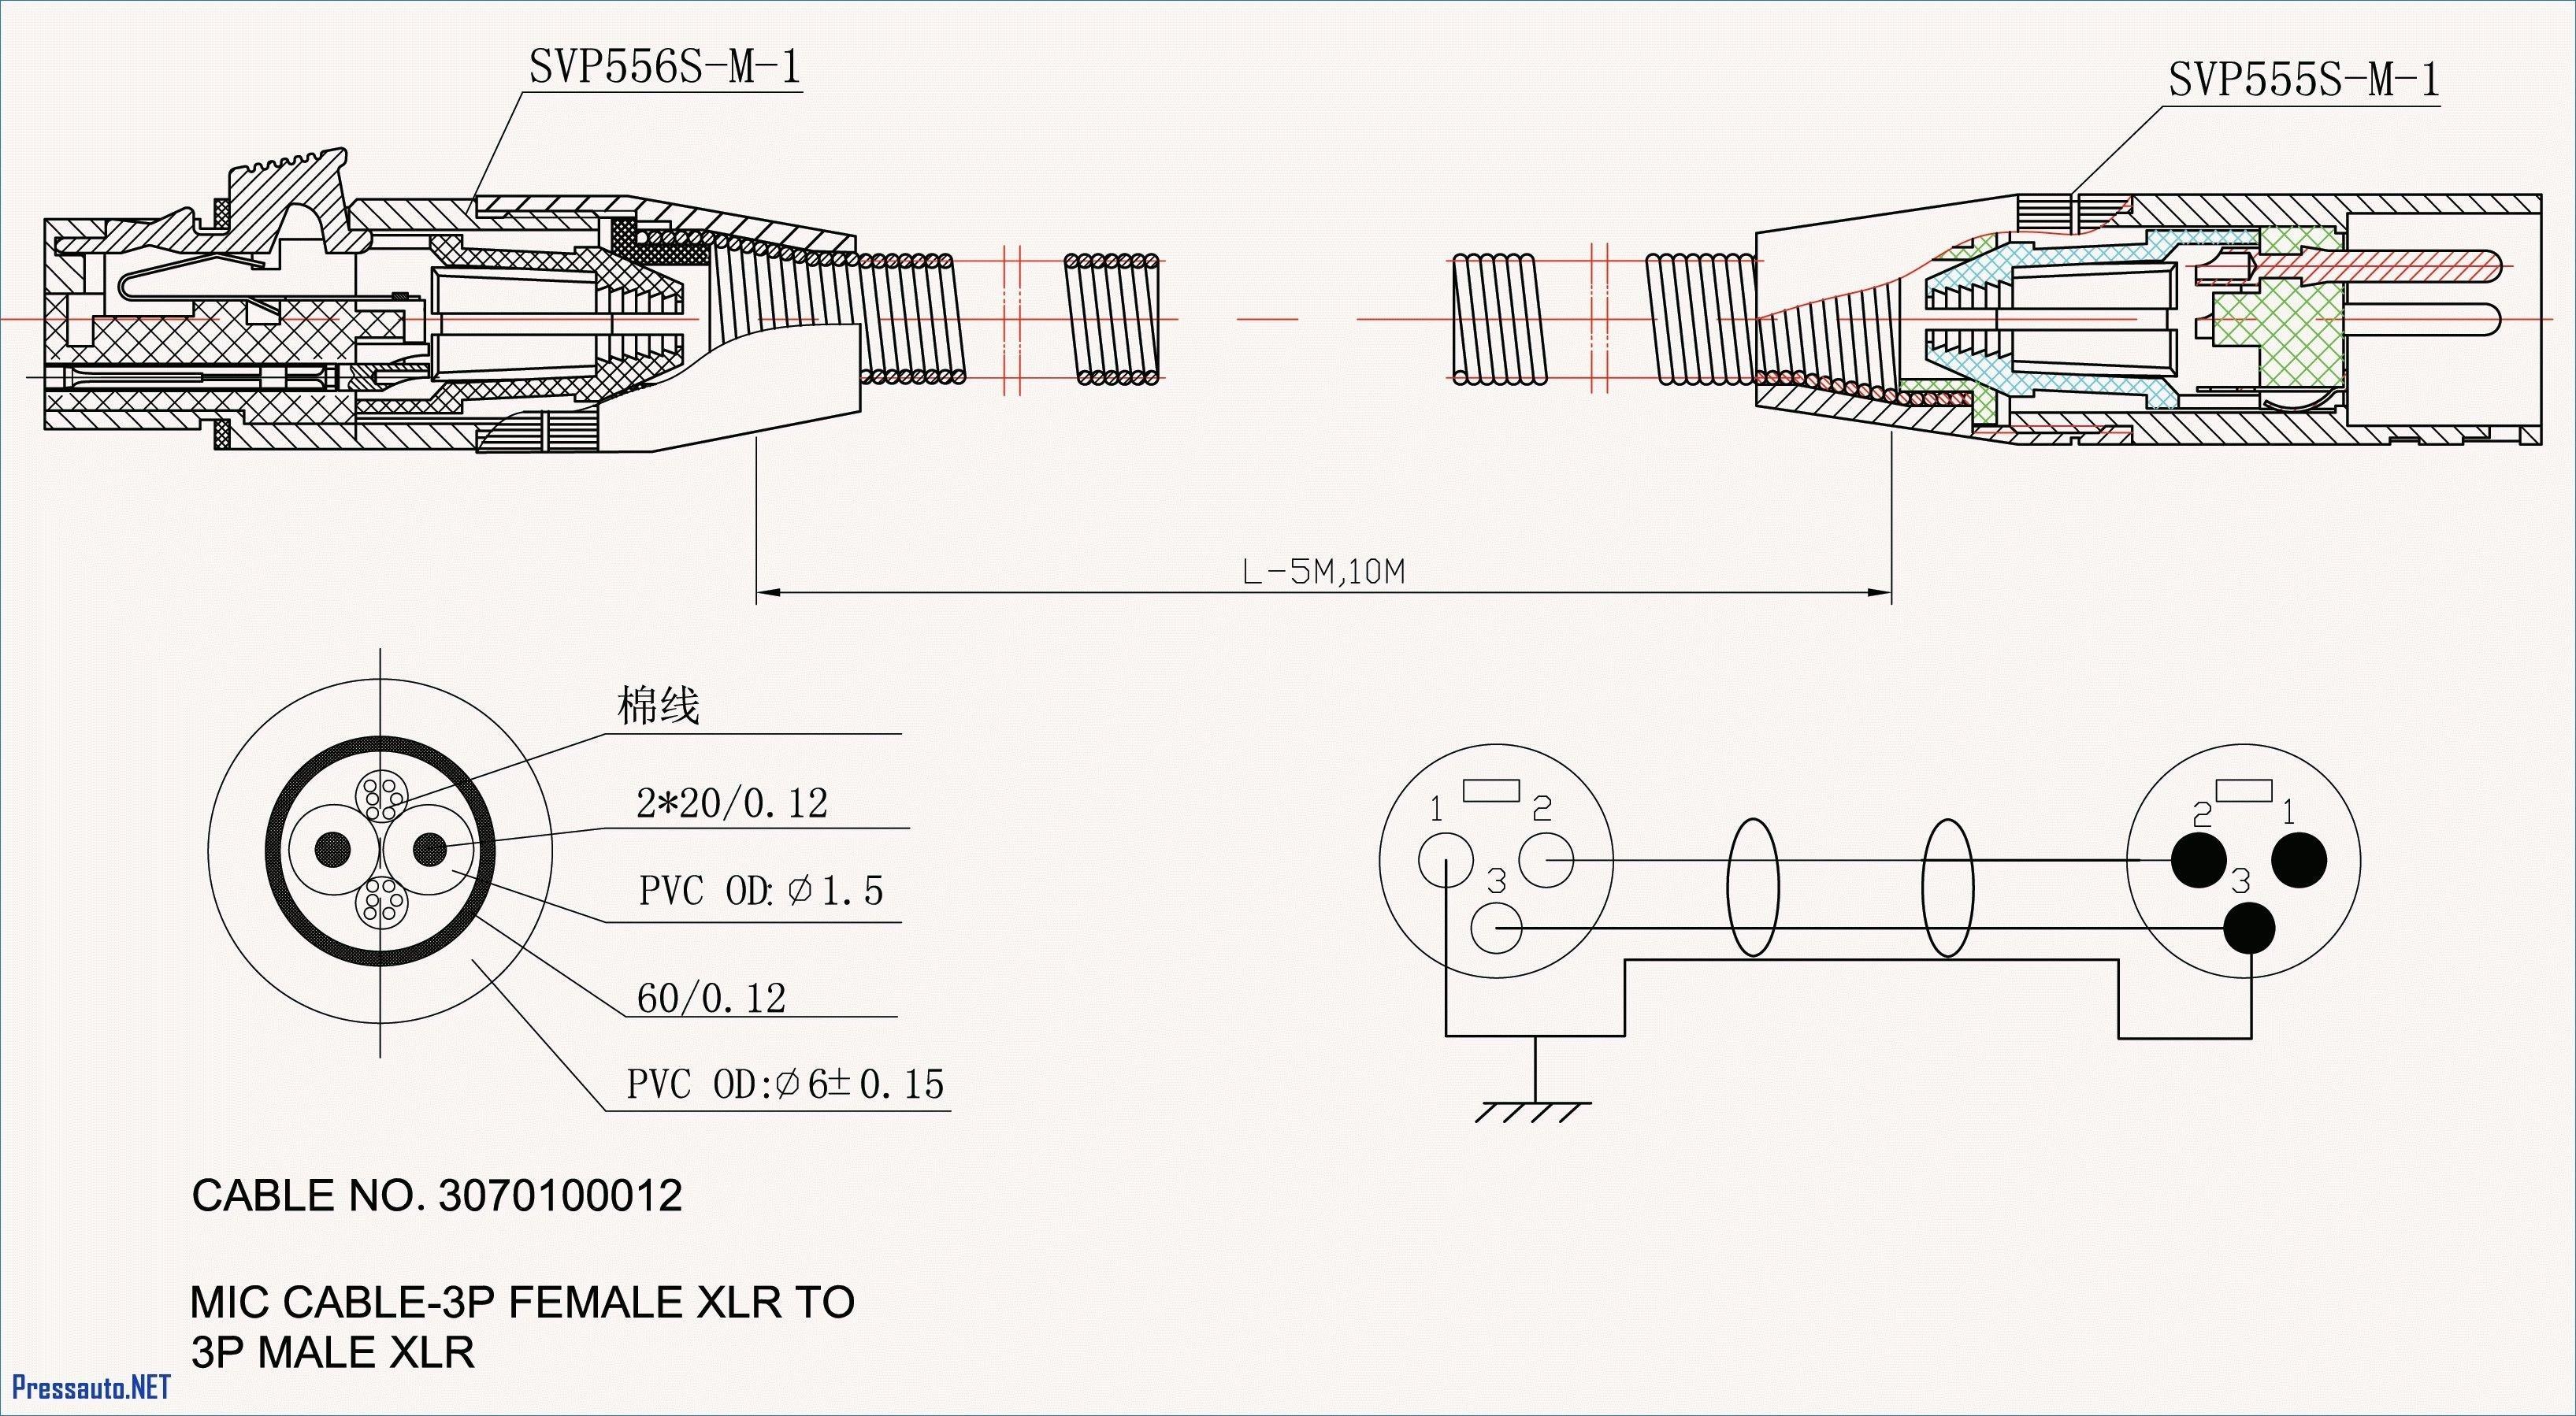 Xlr Connector Wiring Diagram Wiring Diagram Guitar Jack Save Xlr to Mono Jack Wiring Diagram In Of Xlr Connector Wiring Diagram